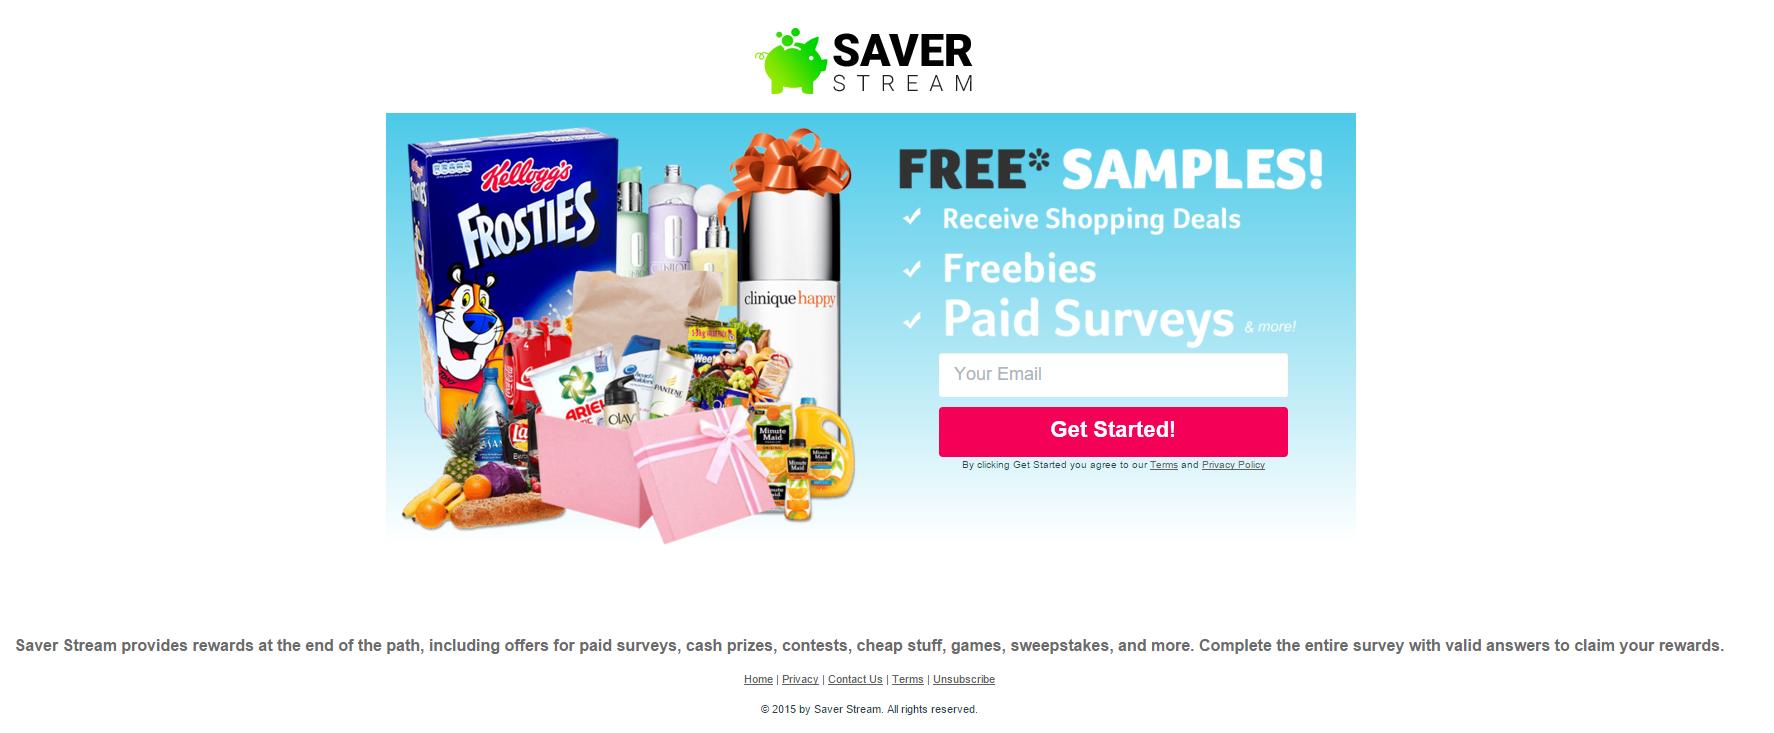 ads by Saver Stream